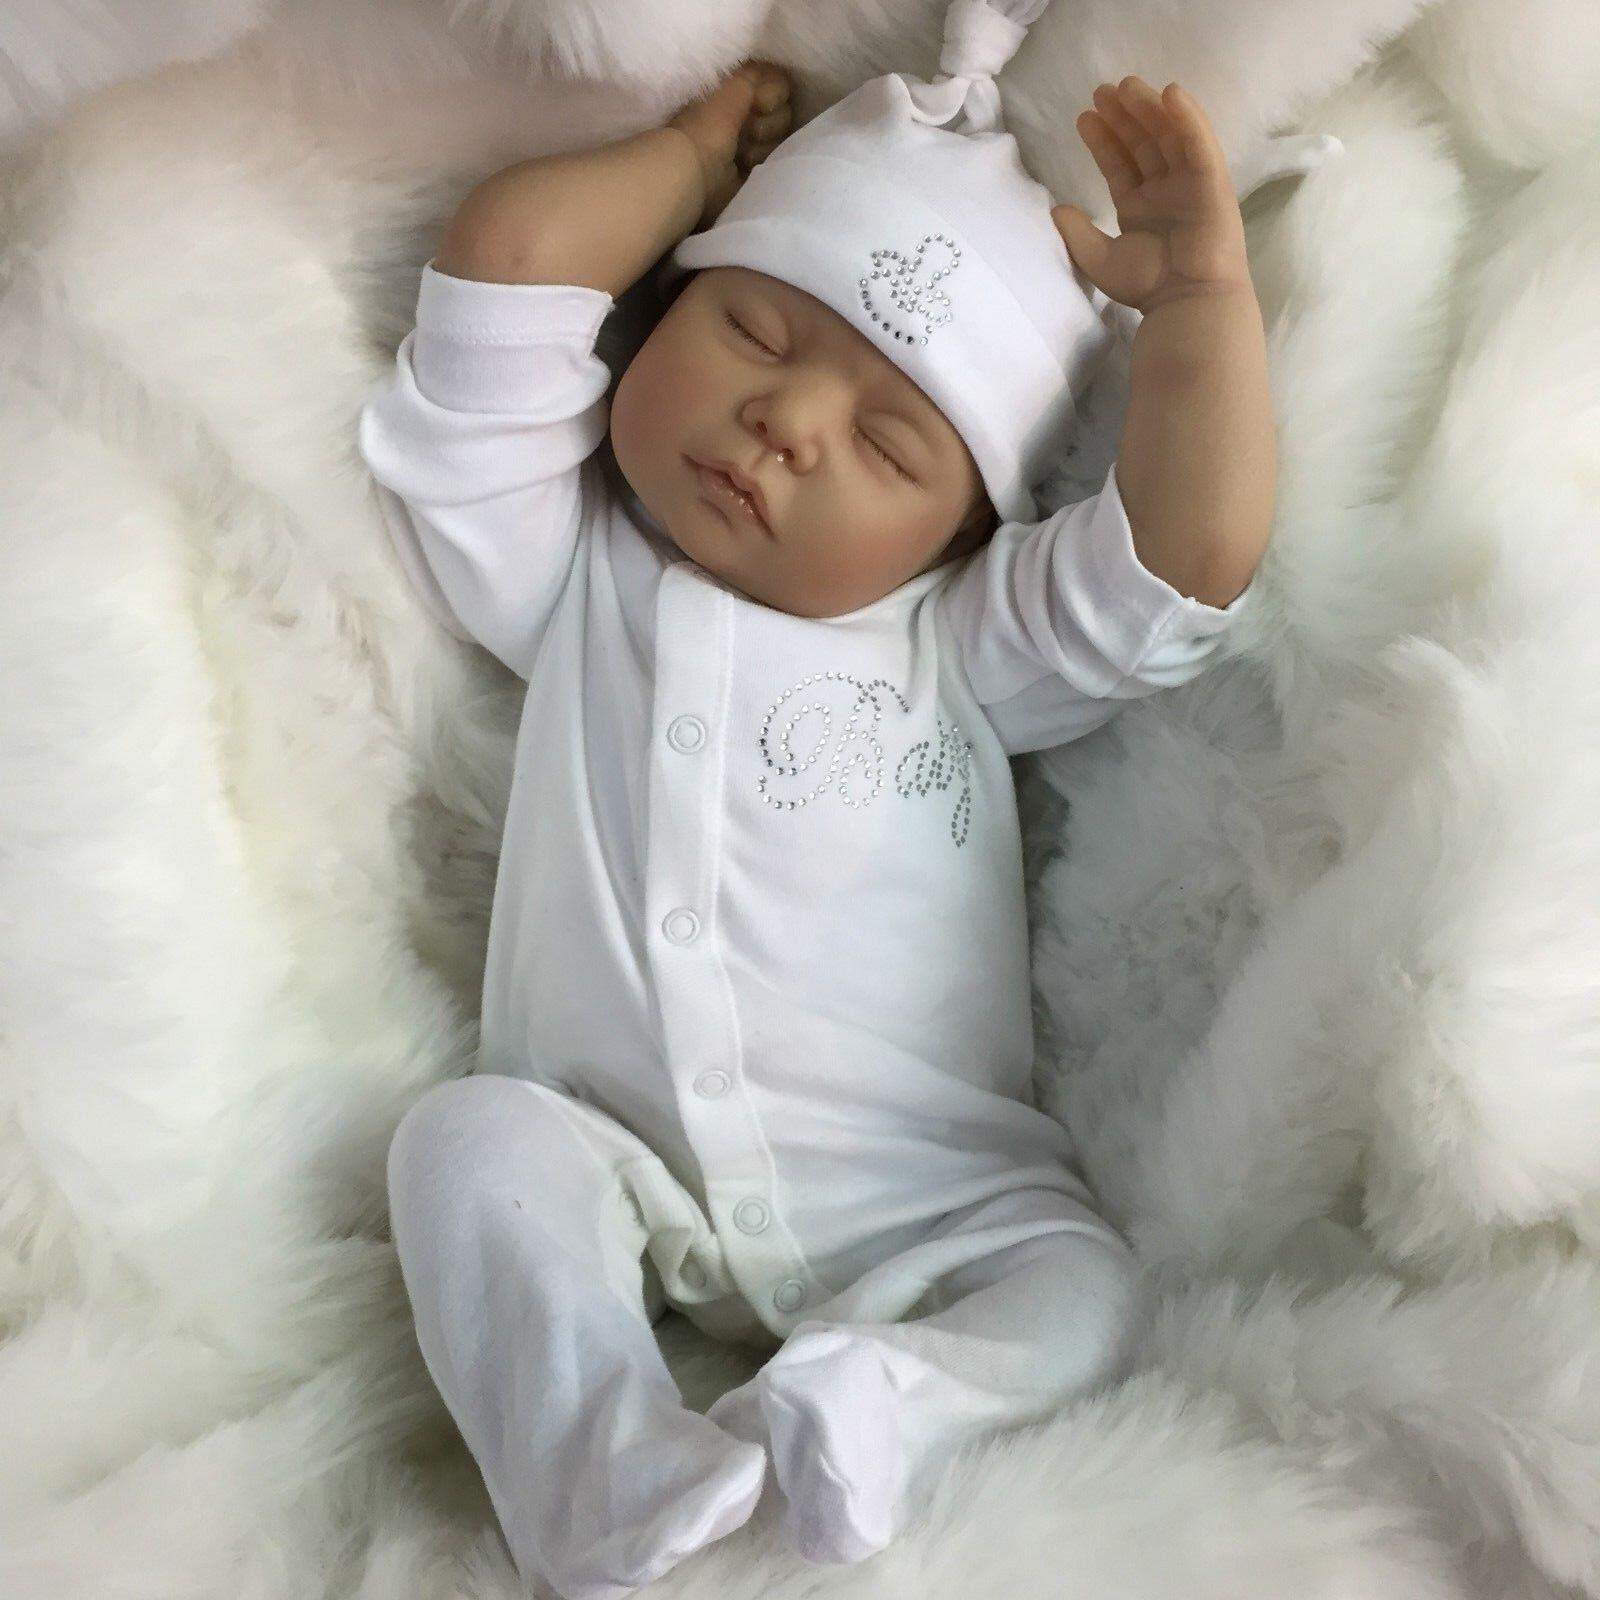 "THERAPY ALZHEIMERS DEMENTIA ADULT REBORN DOLL BABY CODY REALISTIC 22"" NEWBORN UK"